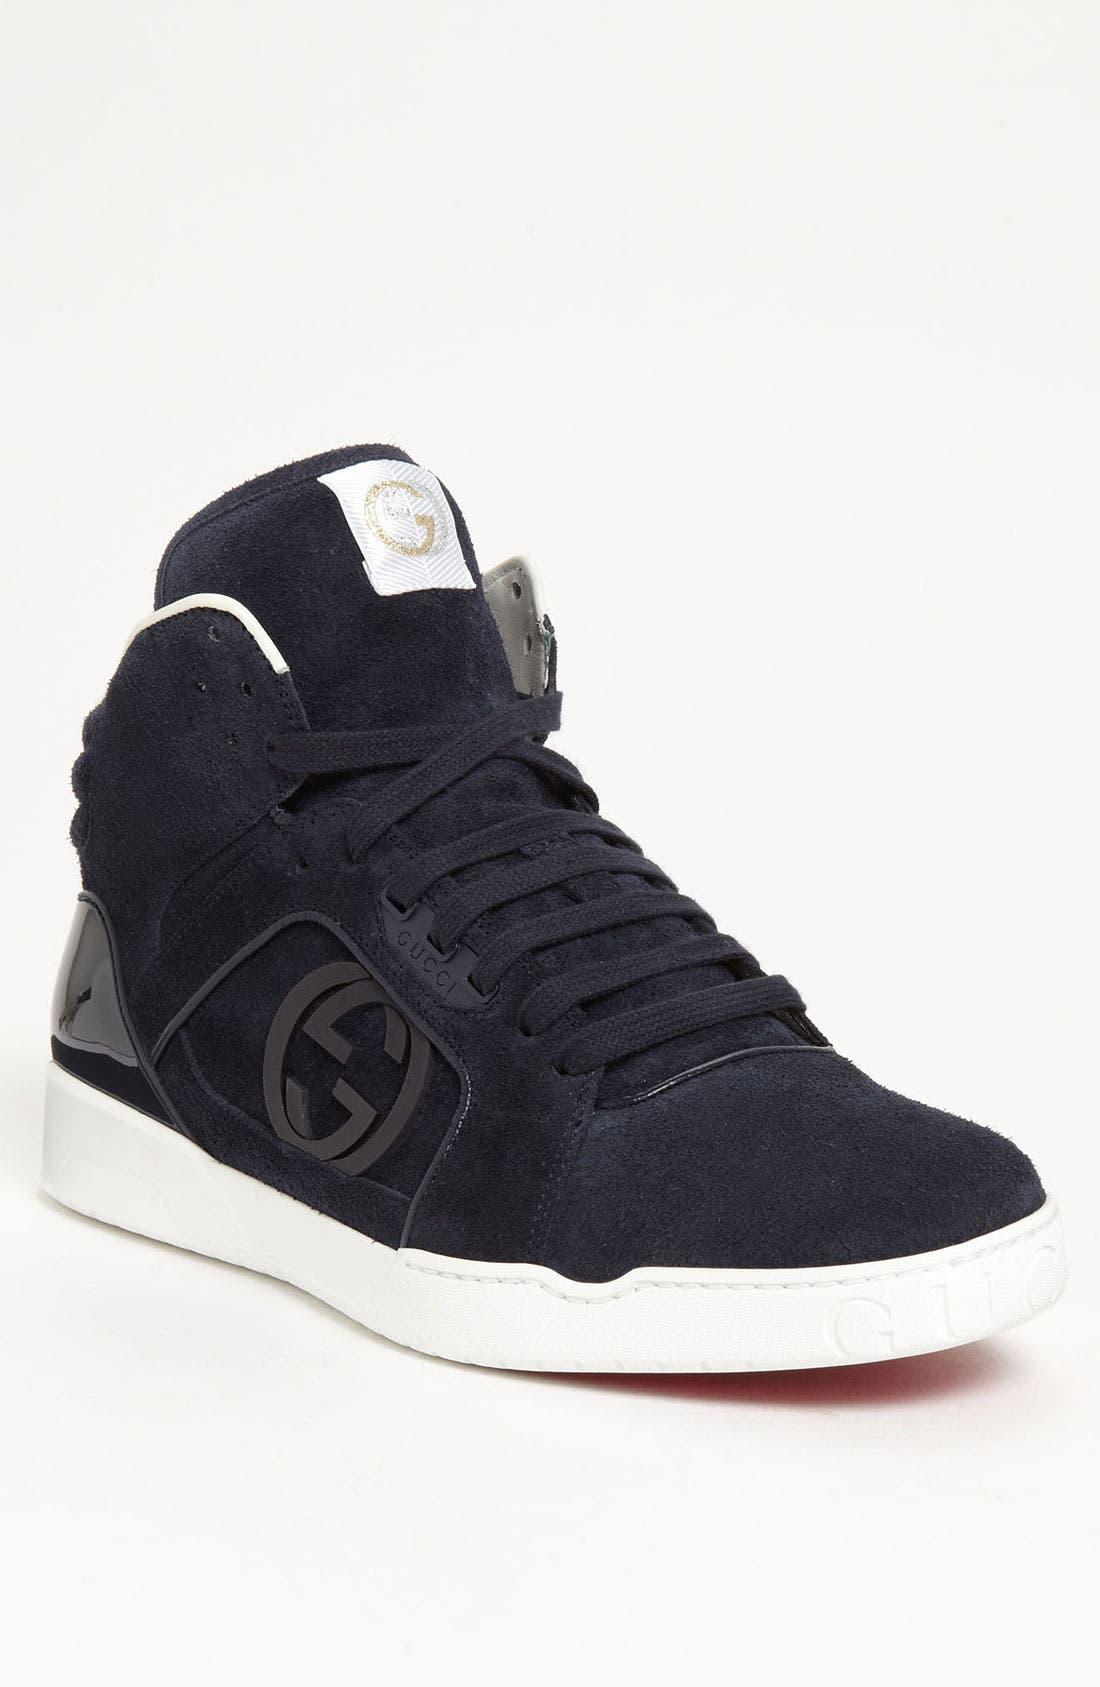 Alternate Image 1 Selected - Gucci 'Rebound Mid' Sneaker (Men)